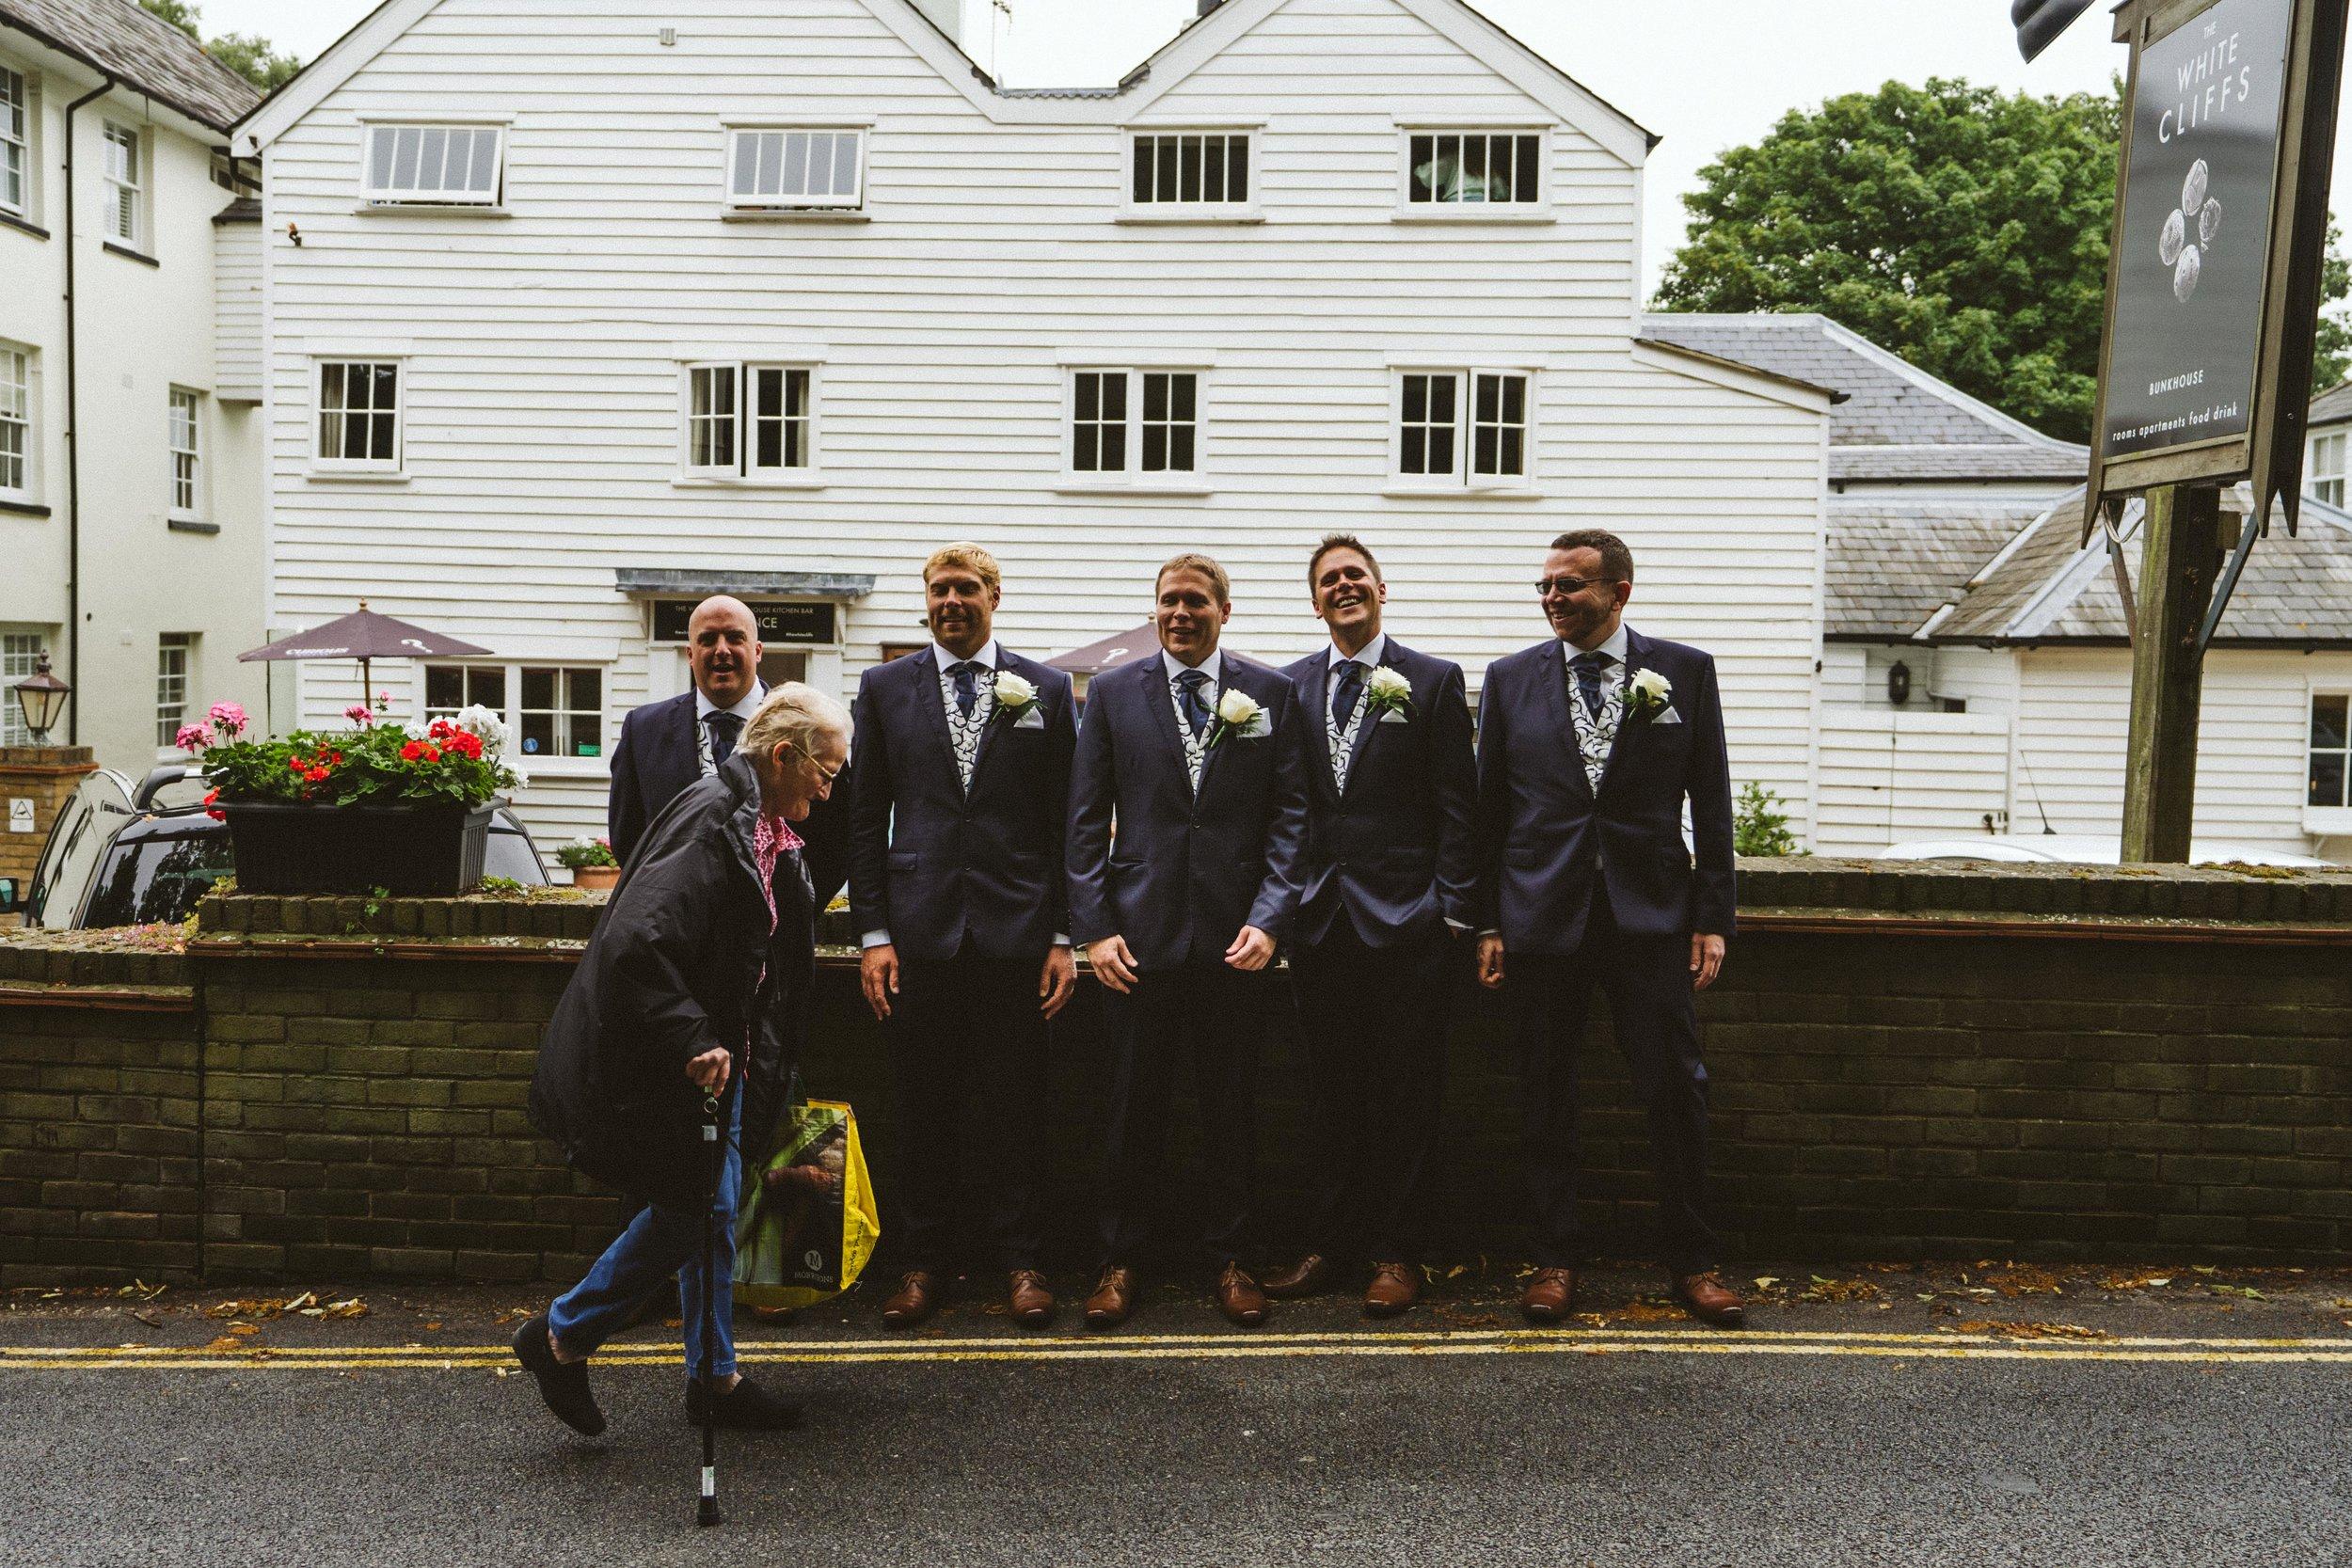 kent-wedding-photographer-100286.jpg